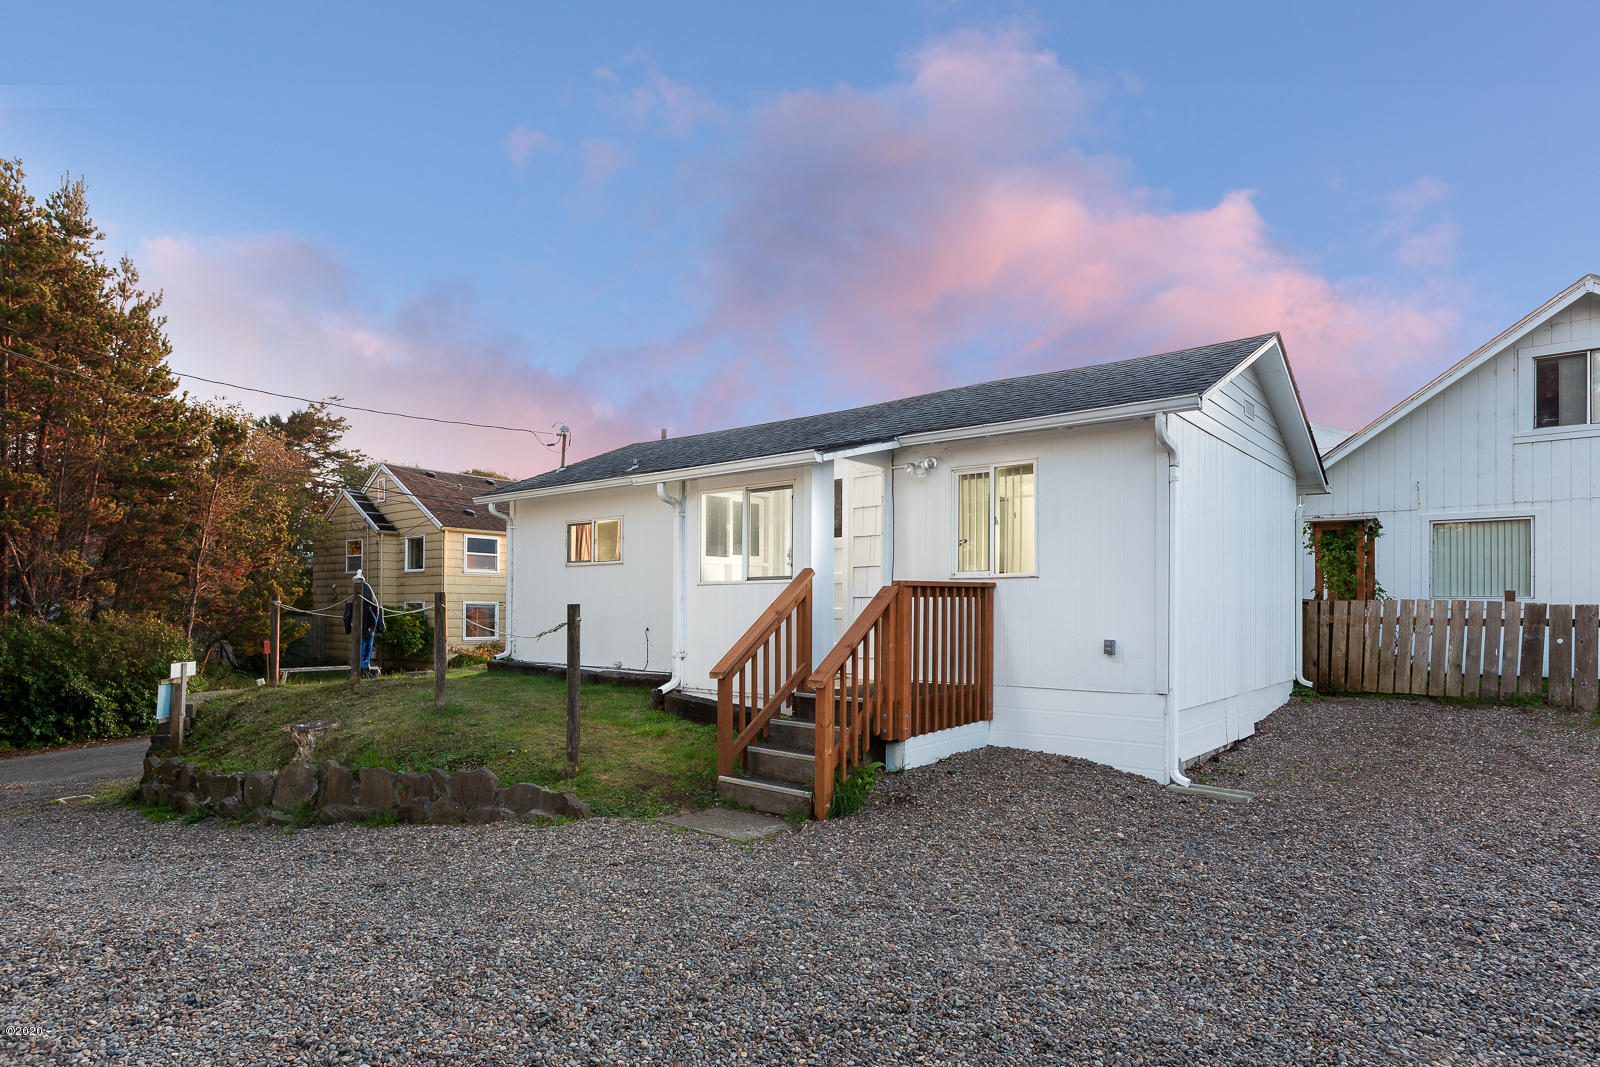 21 & 25 SW Hawkins St, Depoe Bay, OR 97341 - 1 Bedroom Exterior